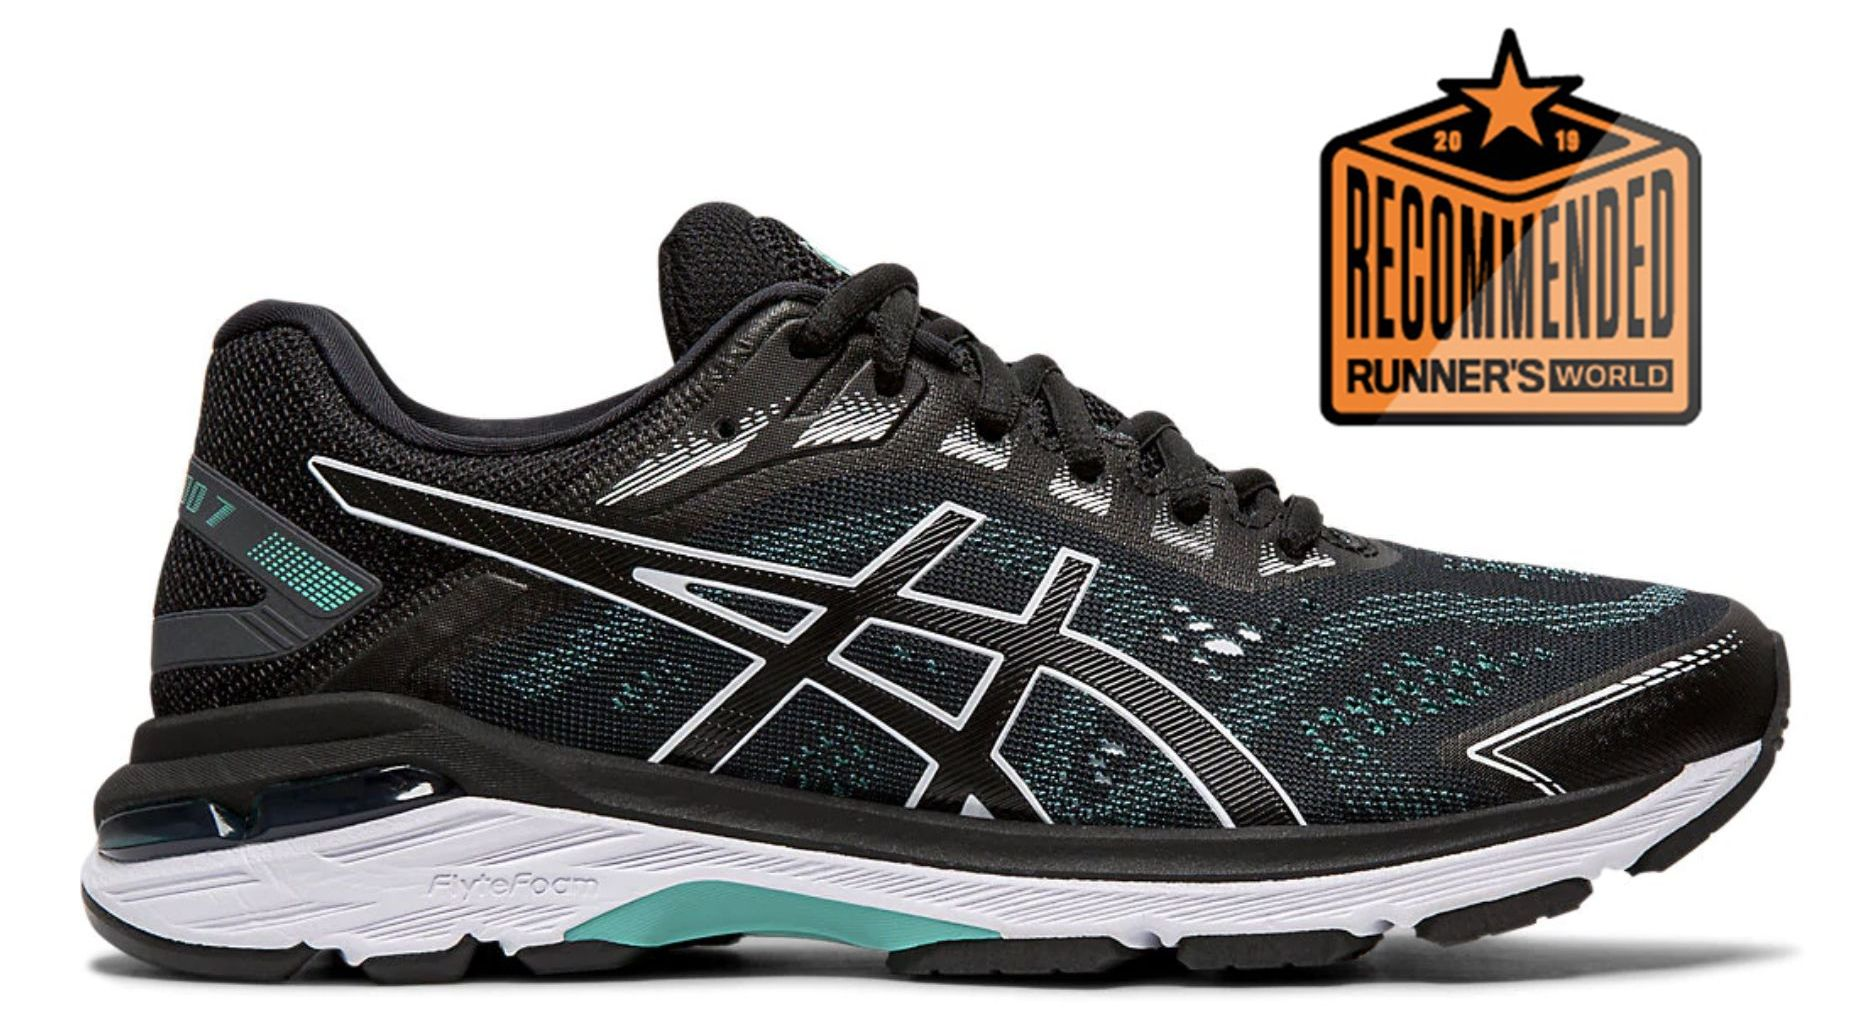 best authentic d1d0f 5b341 Best Running Shoes | Running Shoe Reviews 2019